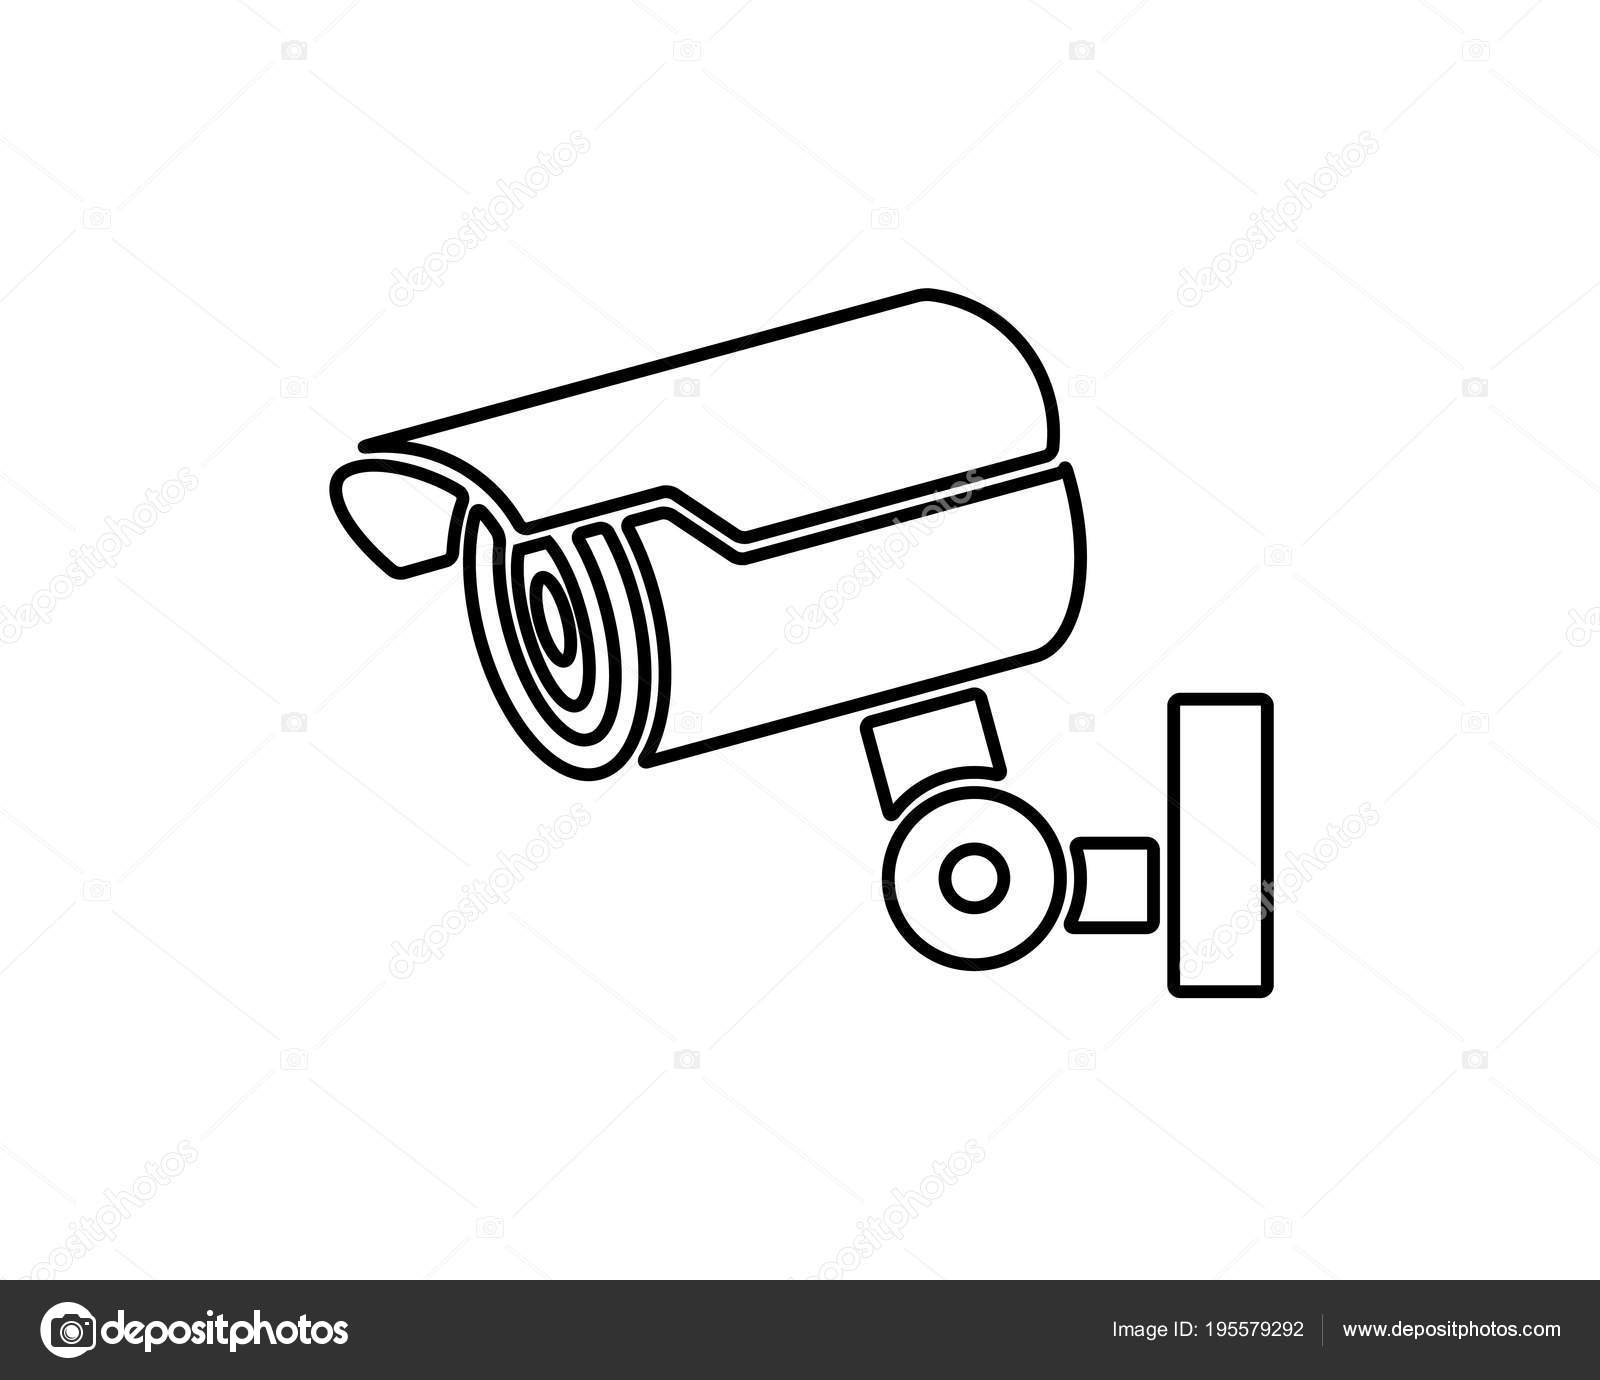 security camera icon design illustration line icon design style Facial Recognition Camera System security camera icon design illustration line icon design style designed for print and web